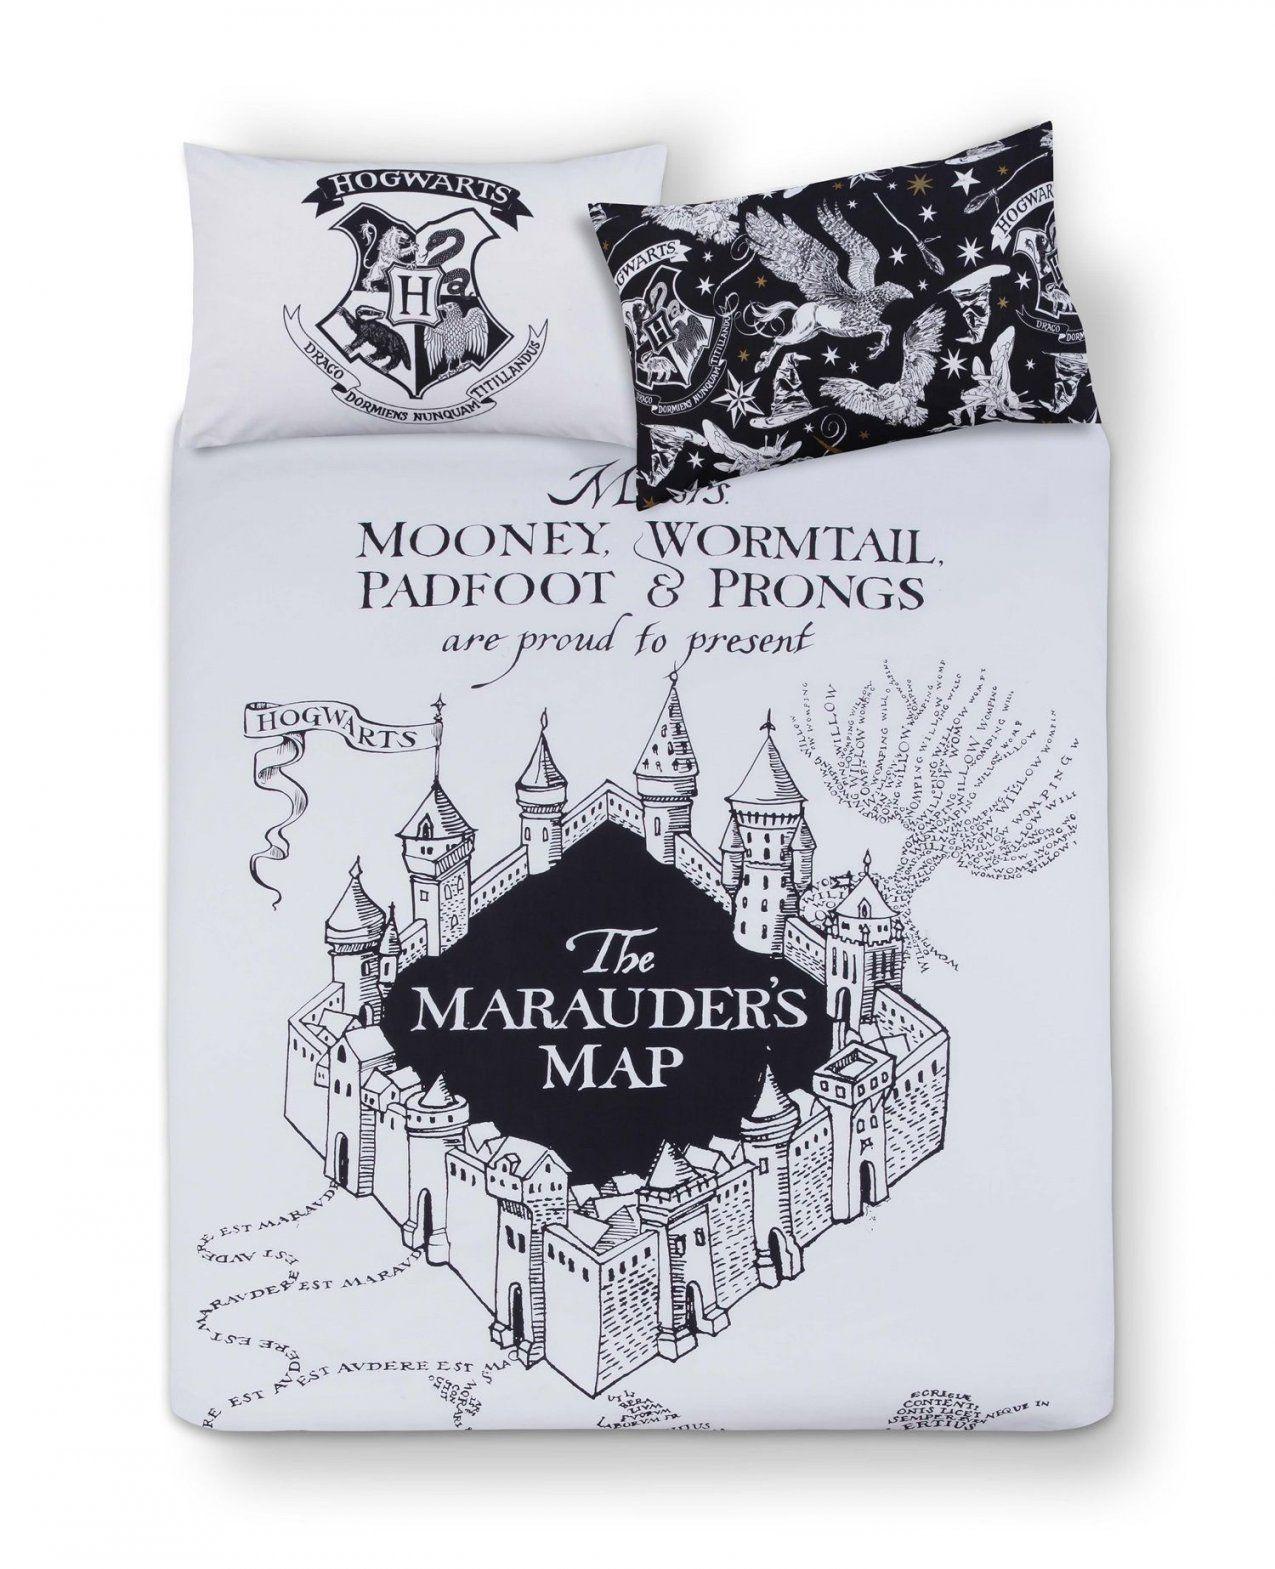 Primark  Harry Potter Mono Double Bed Set  Harry Potter  Pinterest von Primark Harry Potter Bettwäsche Bild